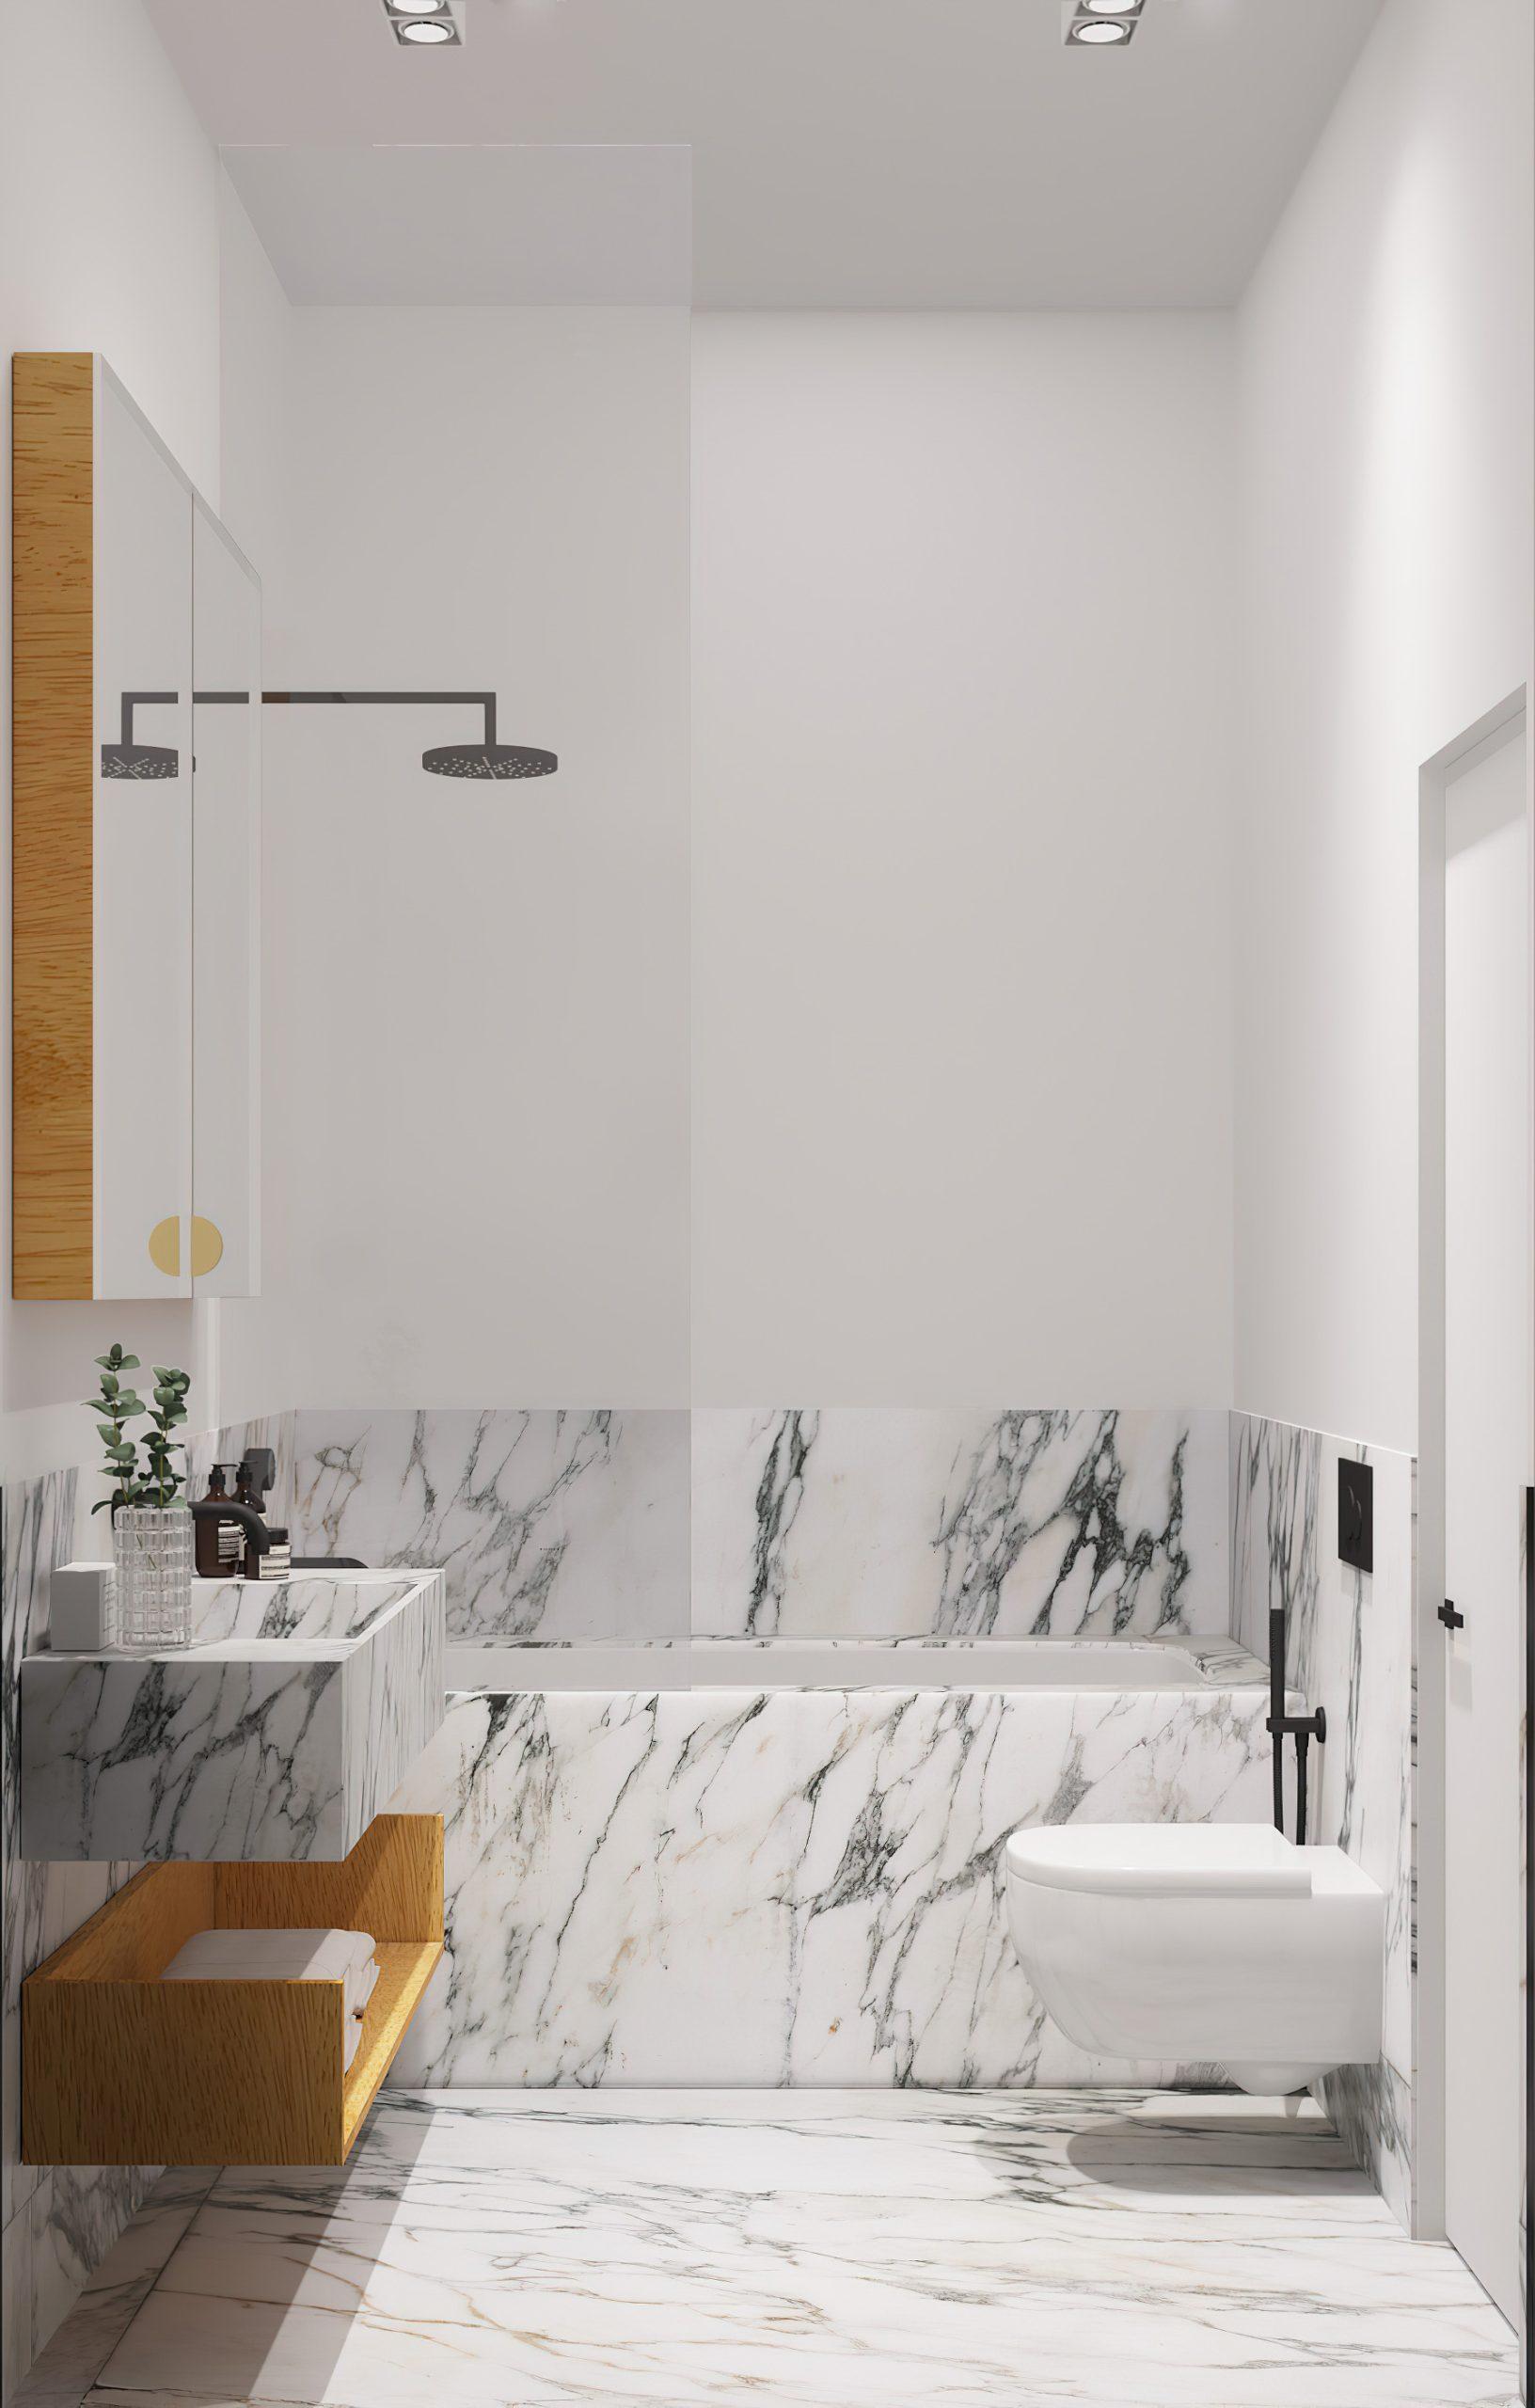 Parisian Apartment Interior Design New York, USA - Harry Nuriev